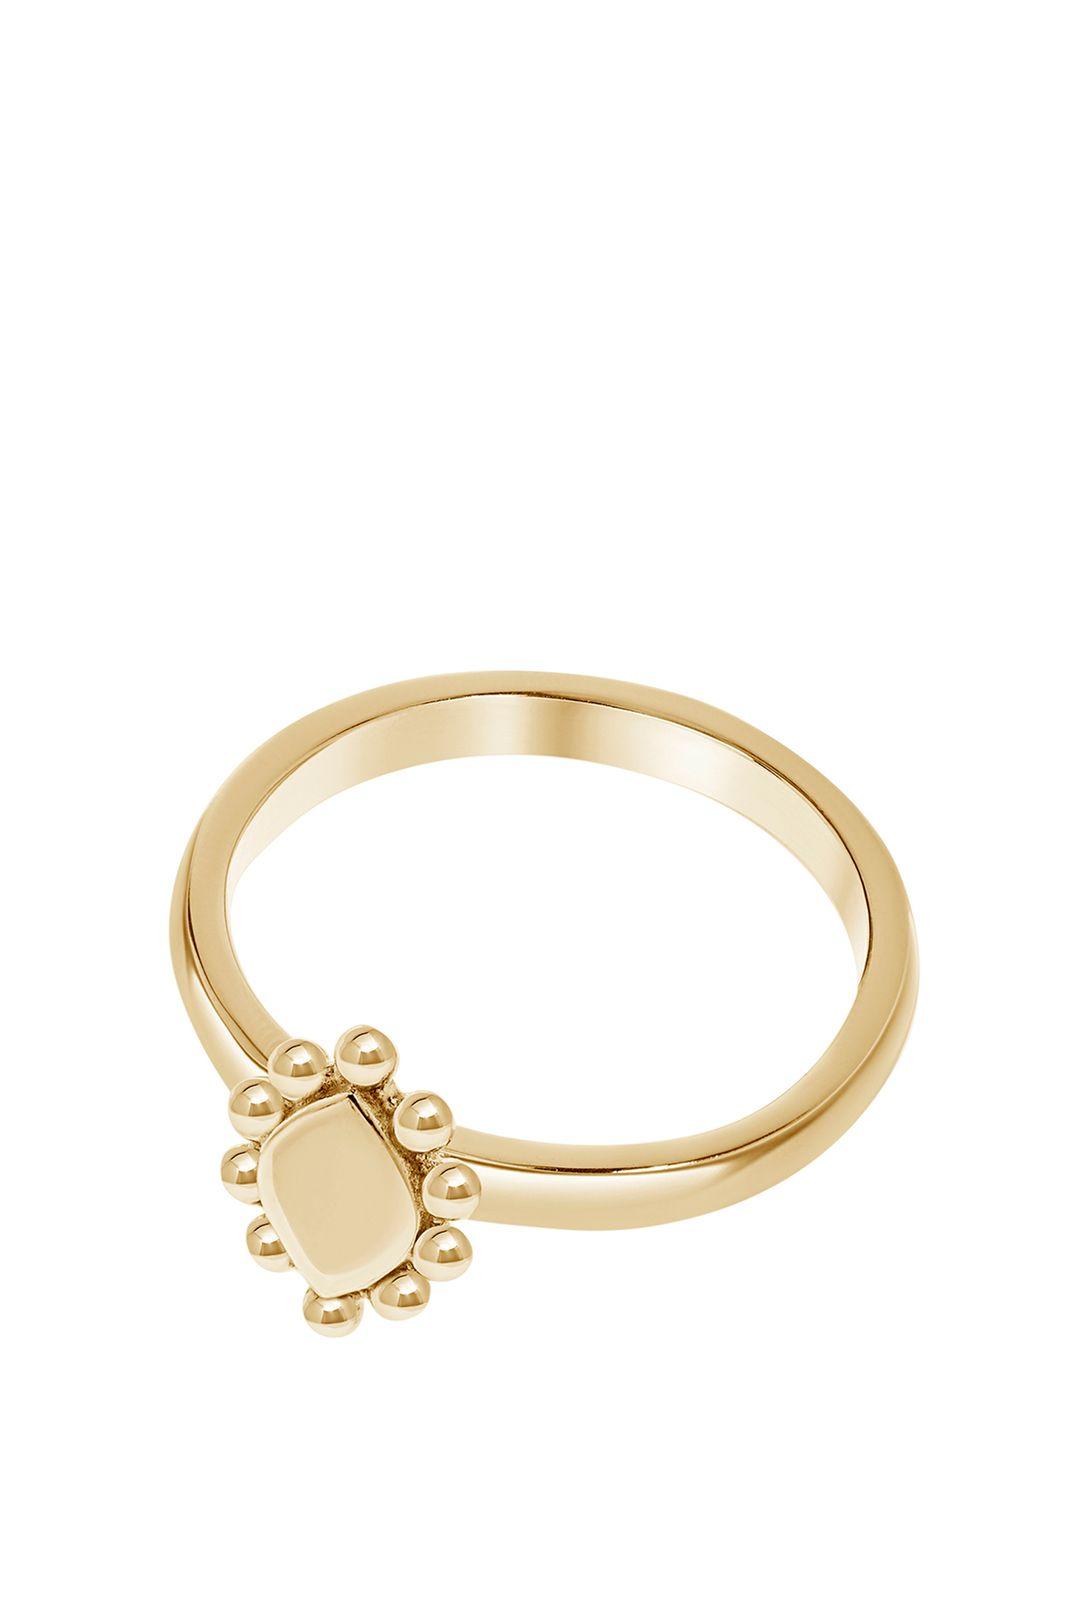 A Brend goldplated ring Soo - Dames   Sissy-Boy